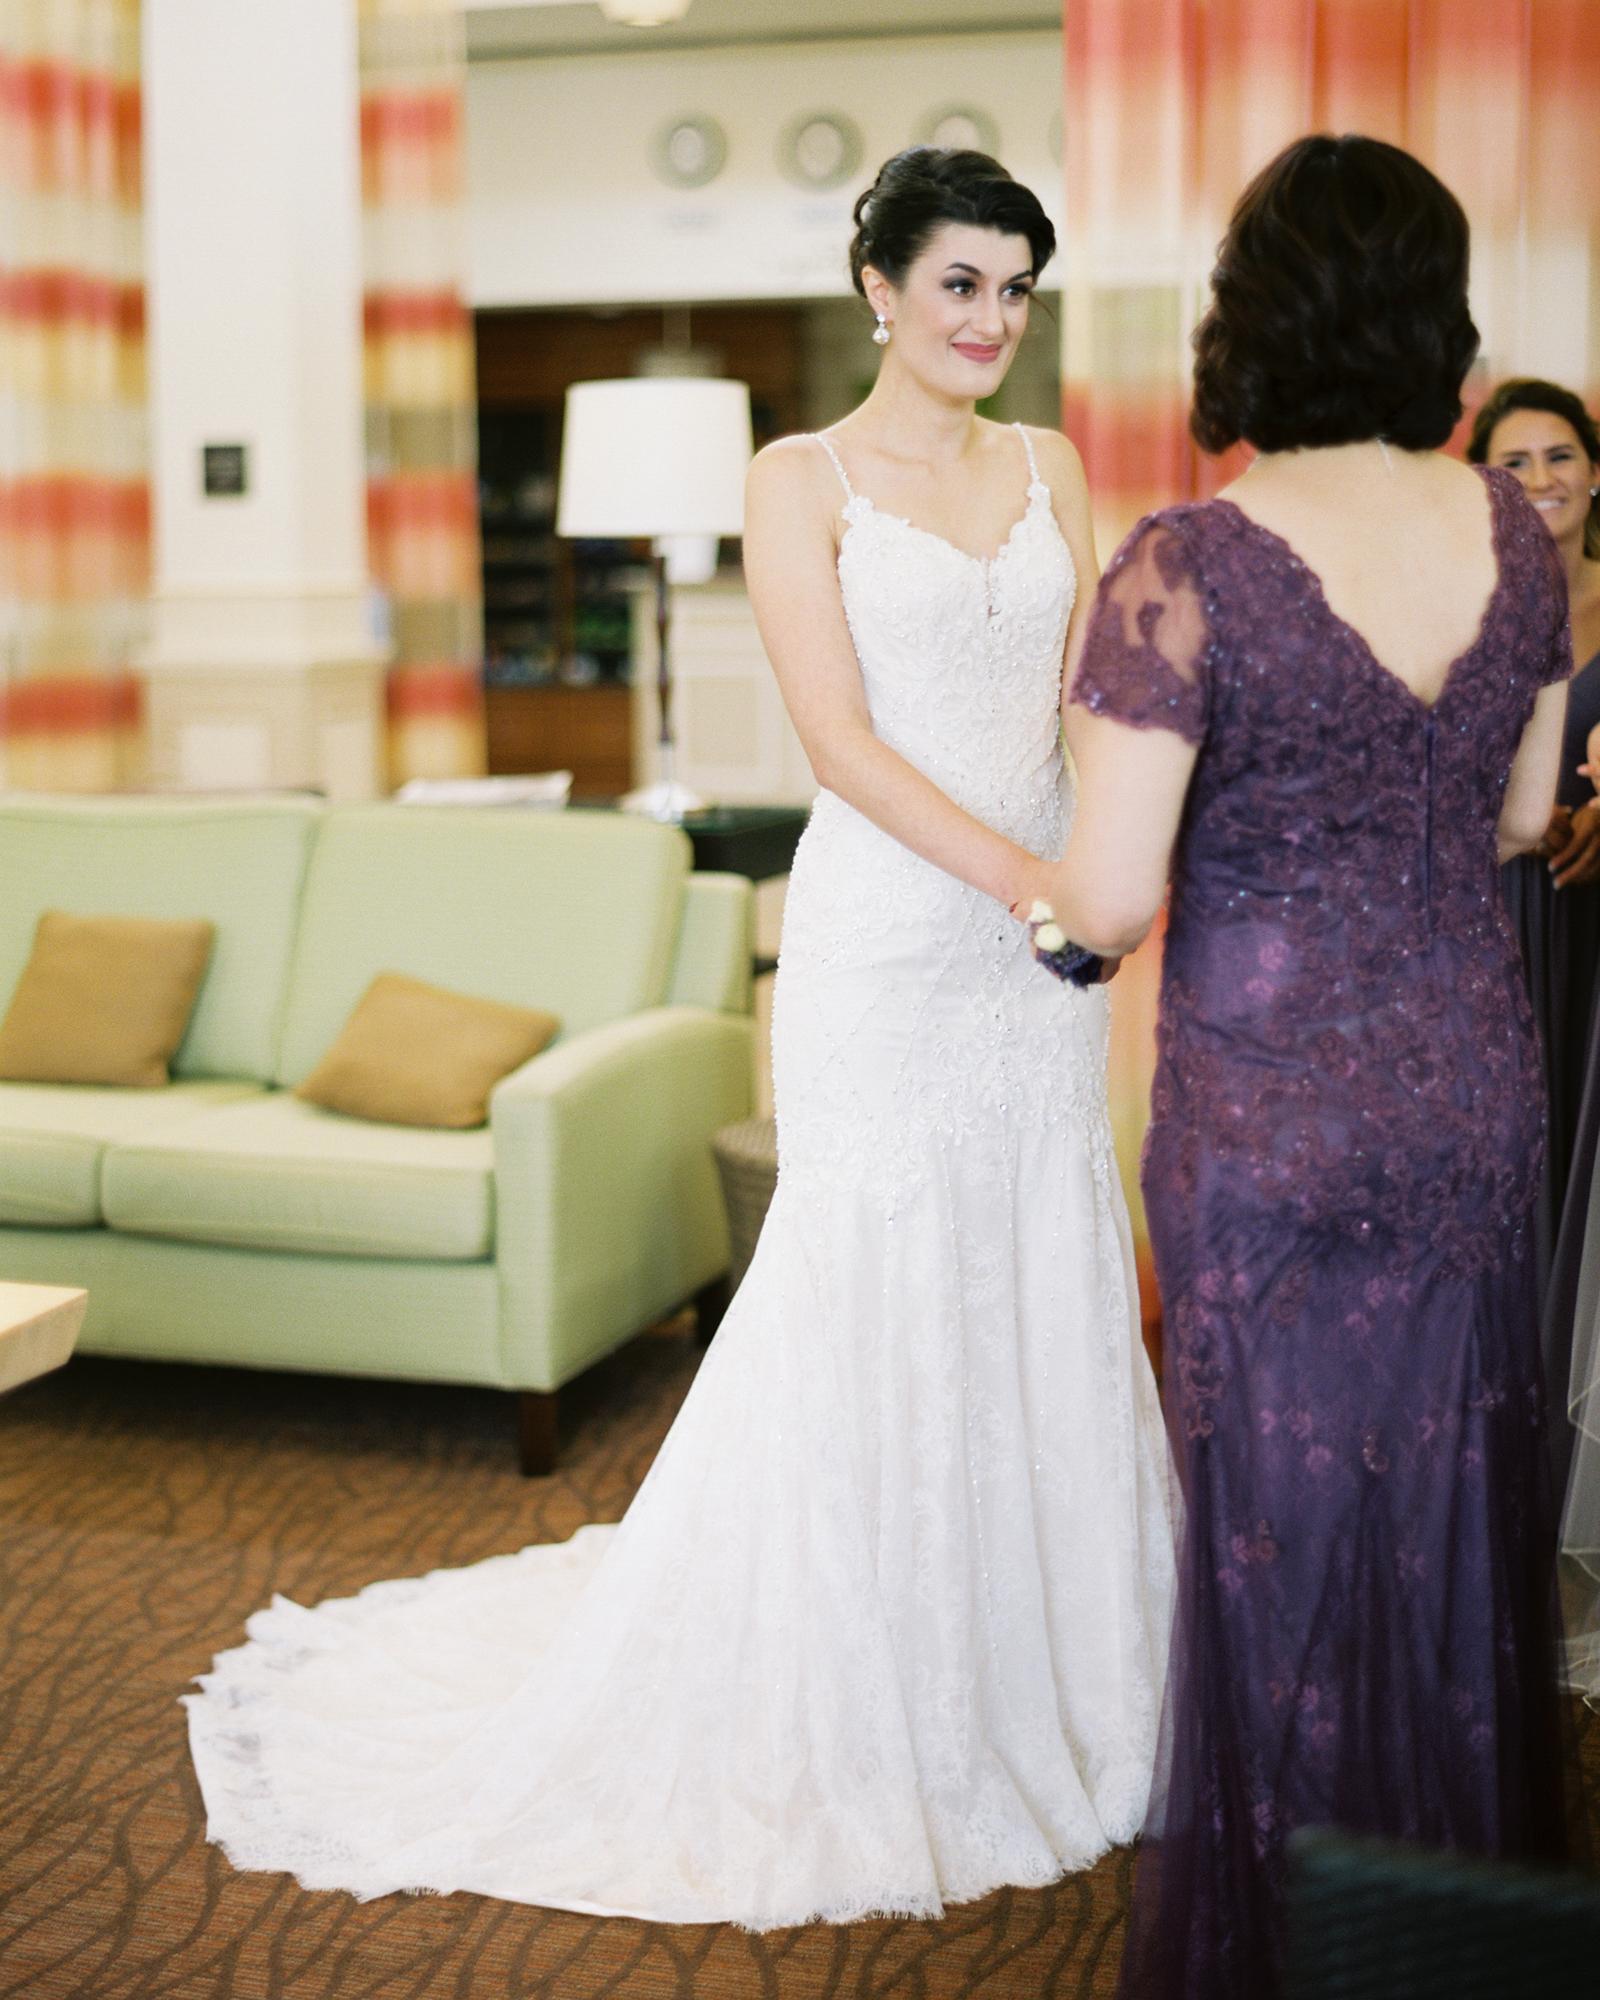 saratoga-springs-new-york-national-museum-of-dance-film-wedding-photographer-5.jpg